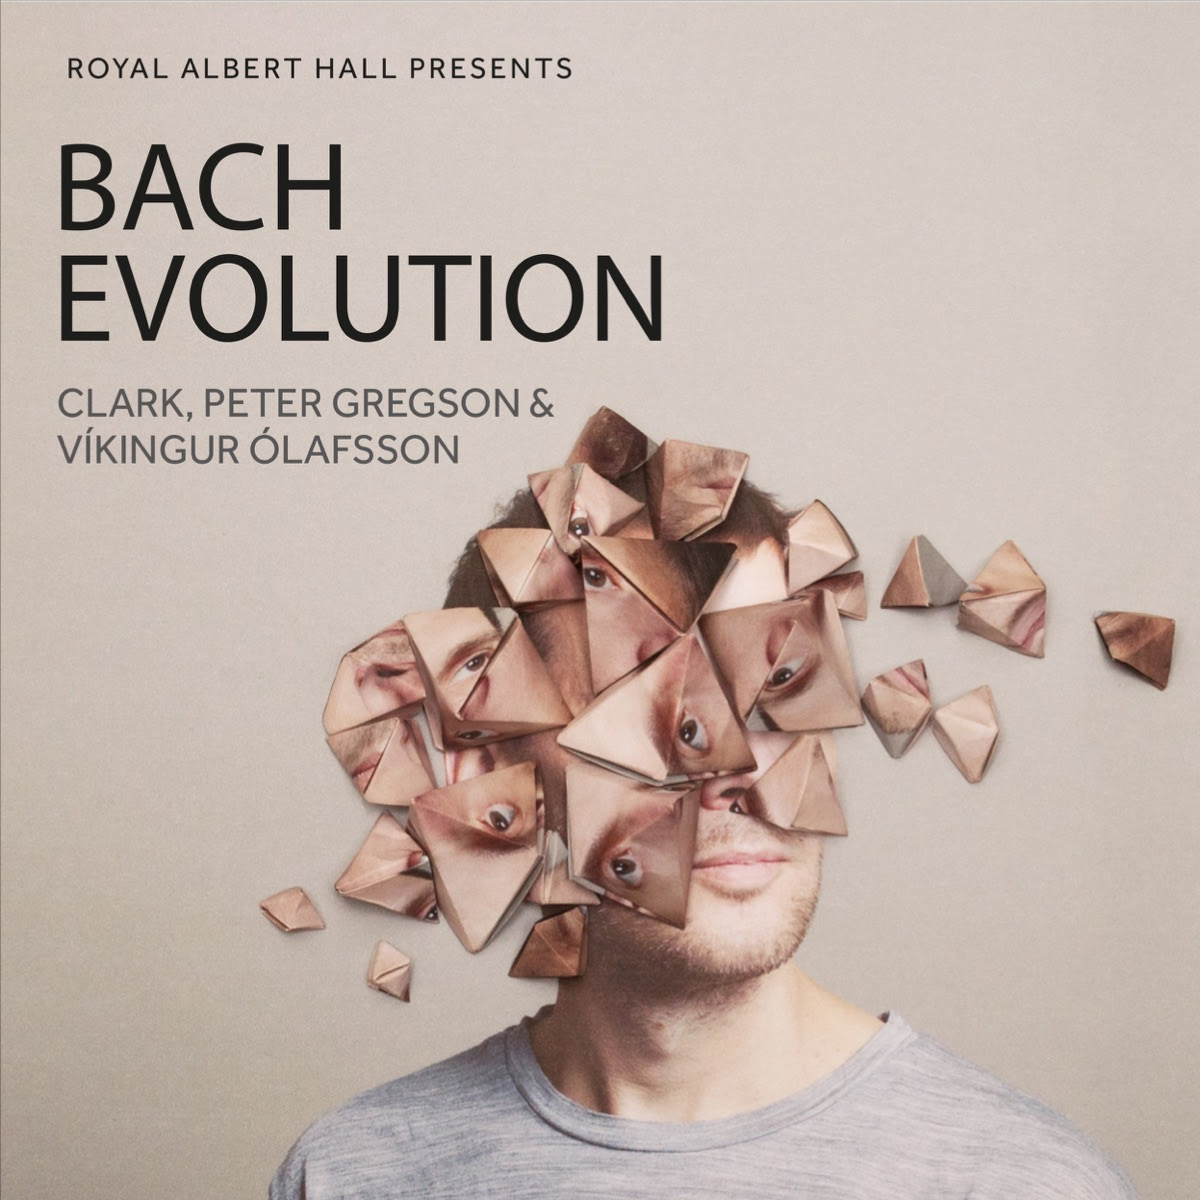 Bach Evolution Poster